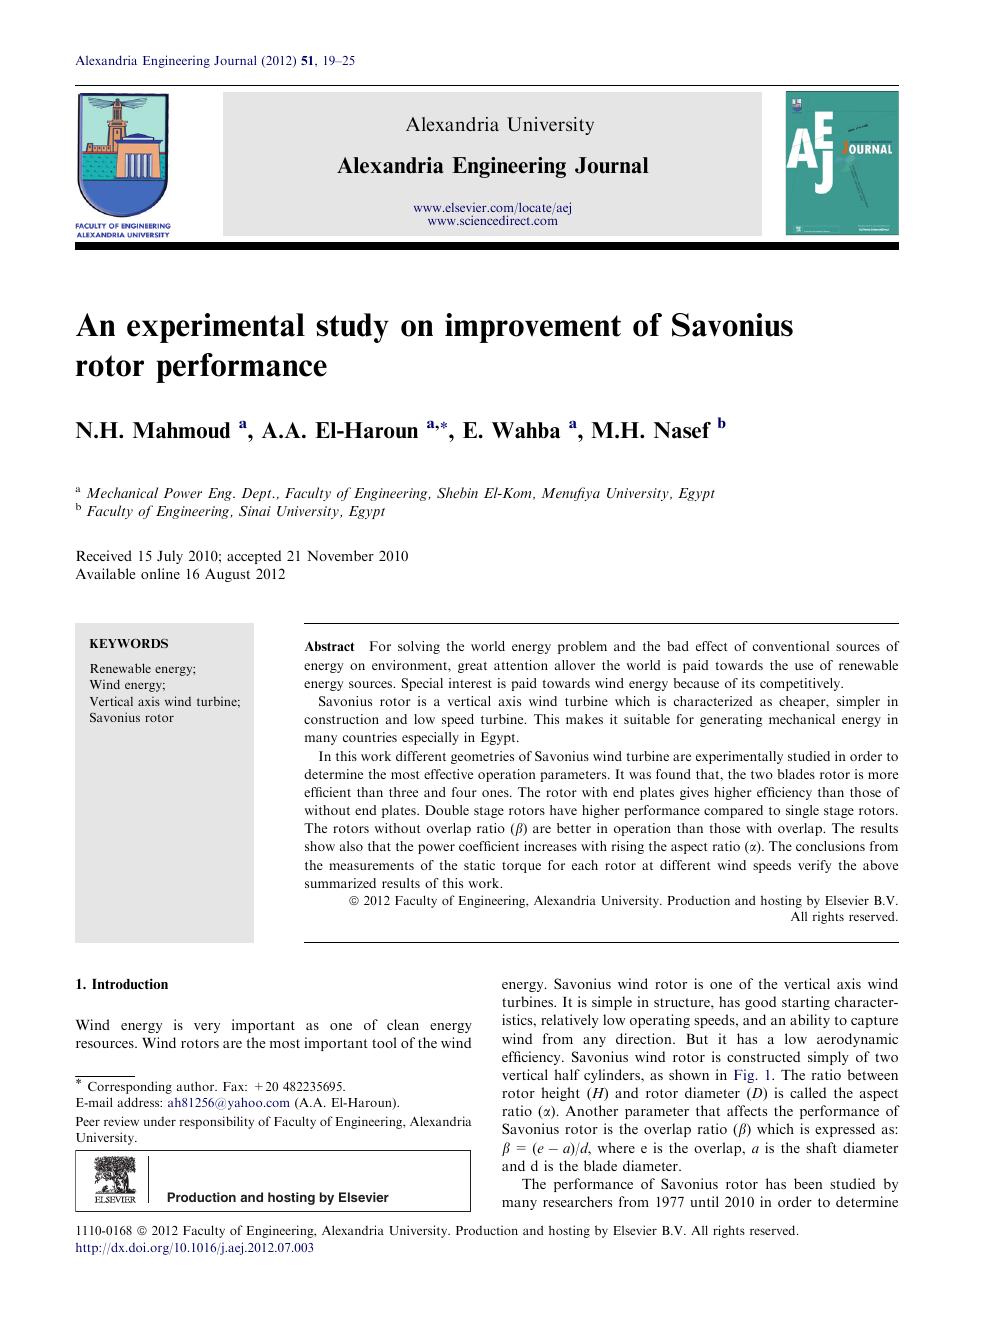 An experimental study on improvement of Savonius rotor